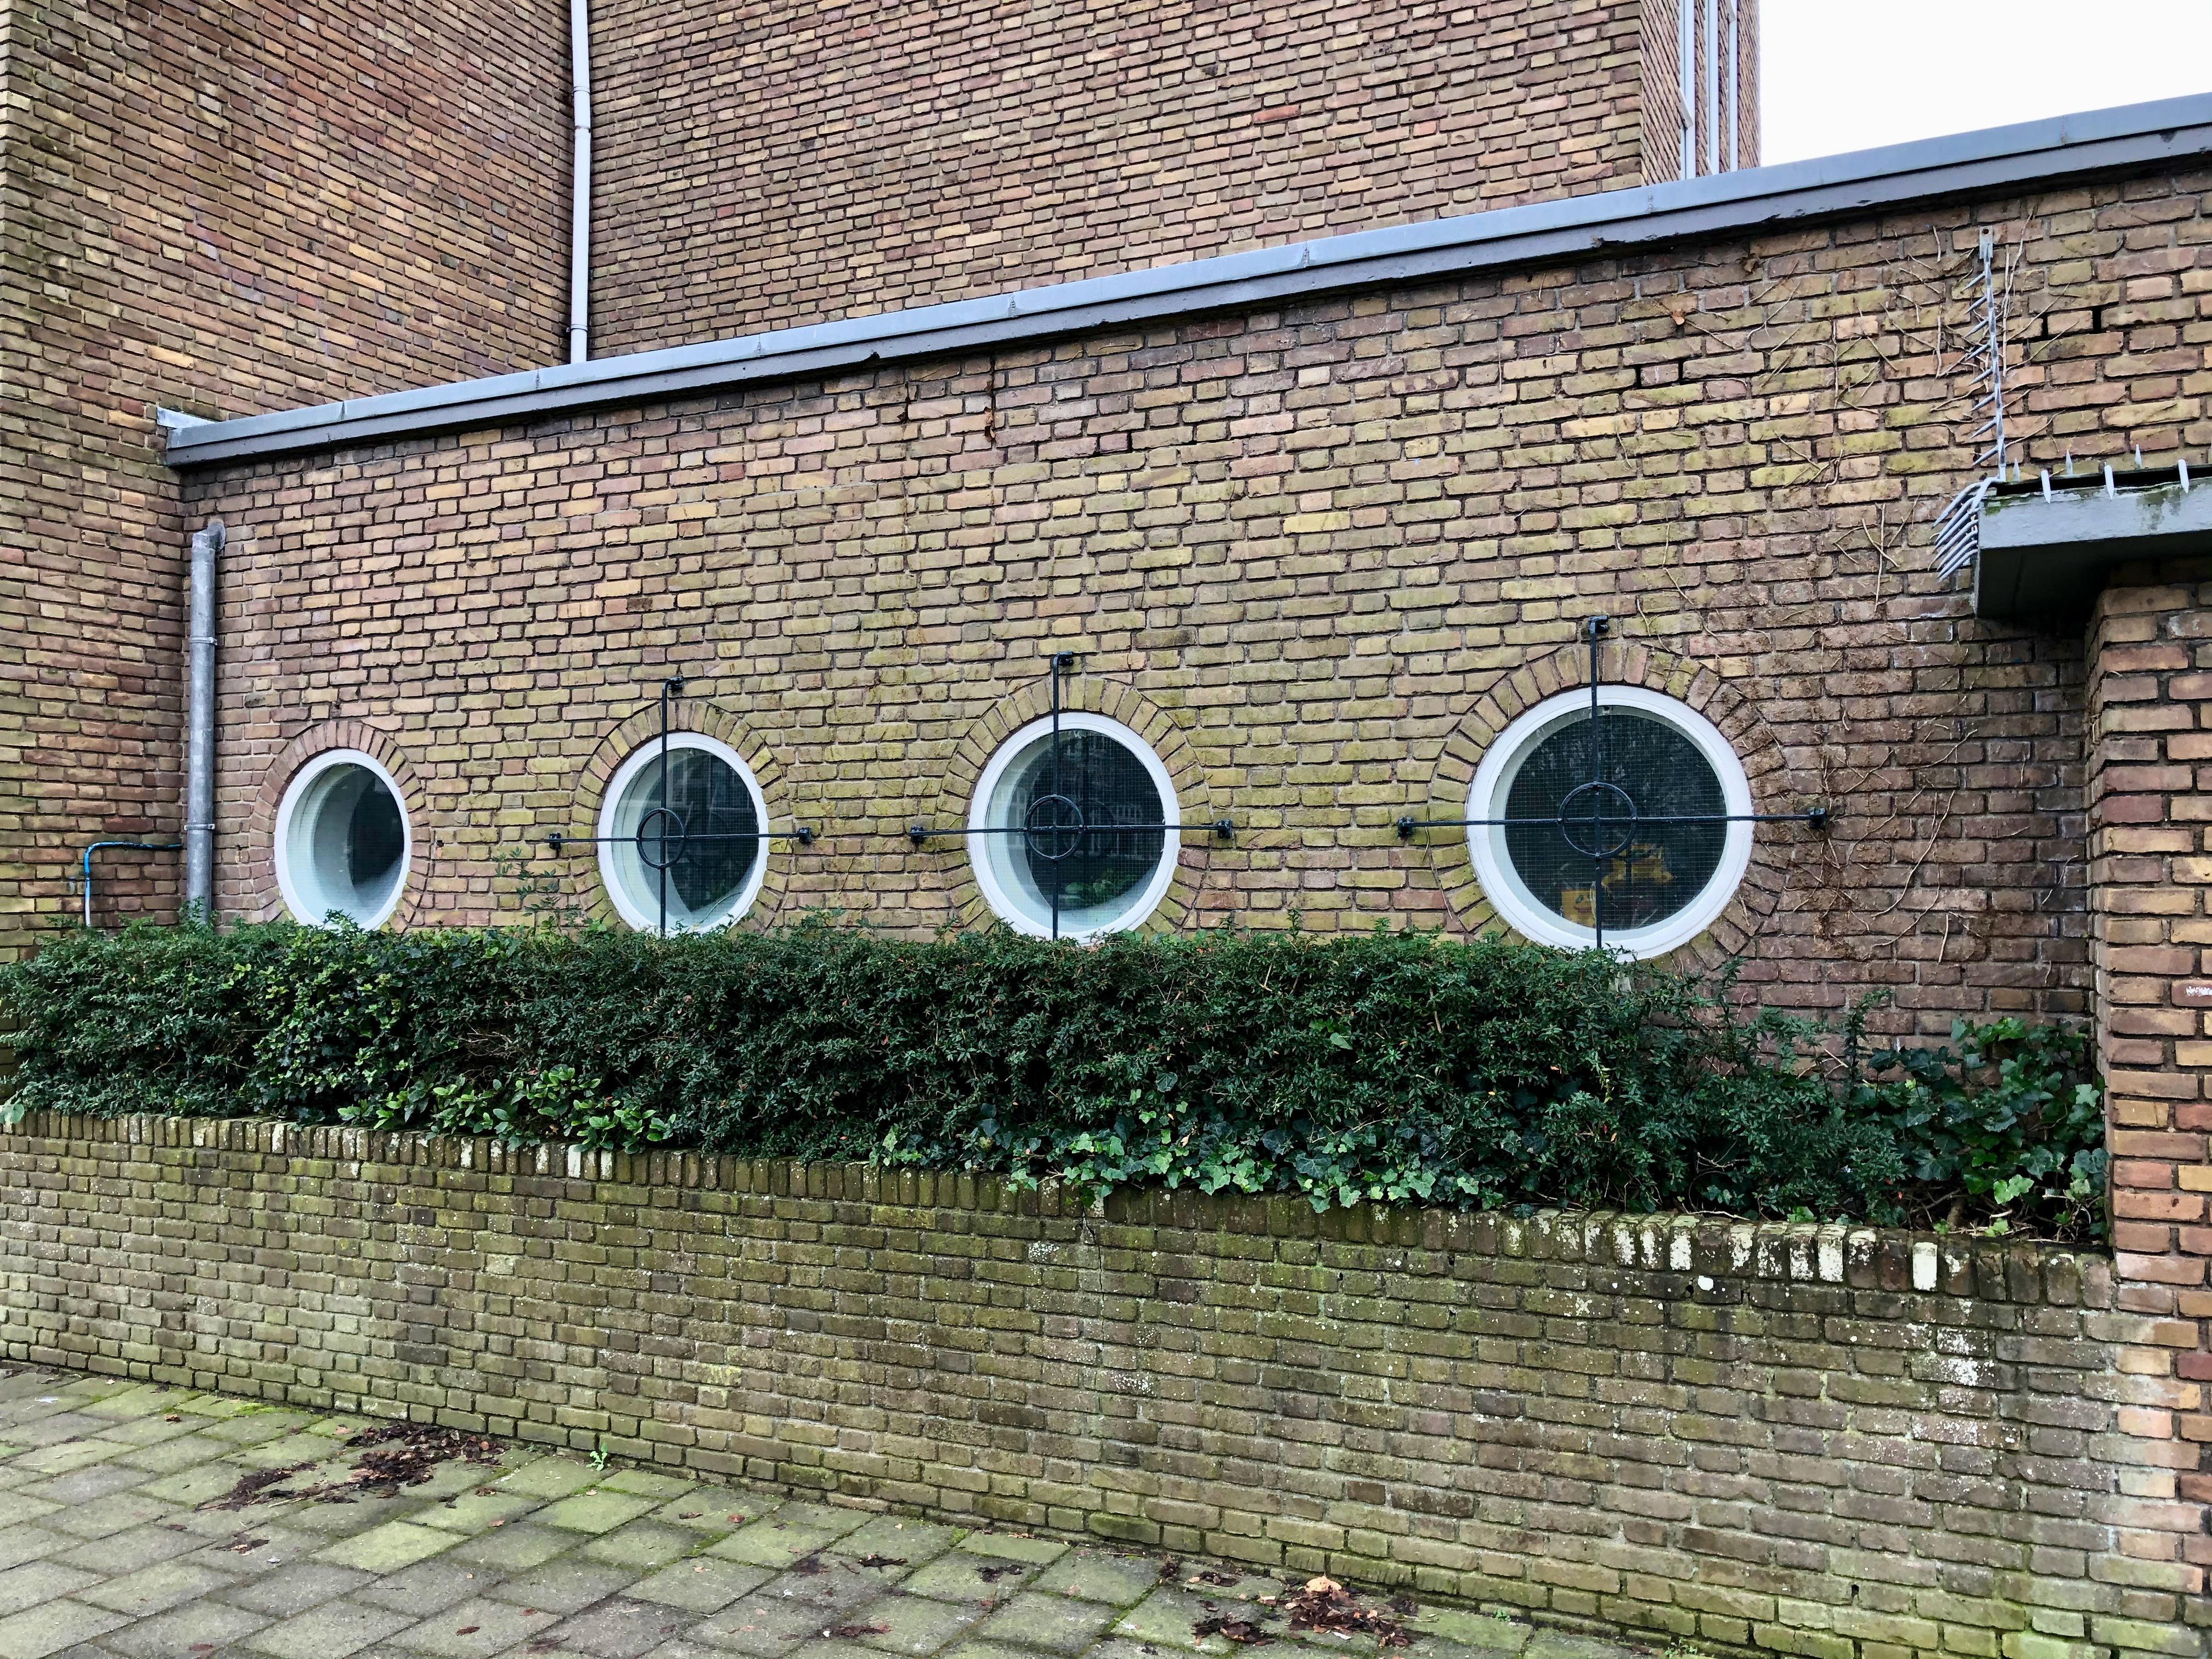 Linaeusschool, Haarlem, P. F. de Bordes